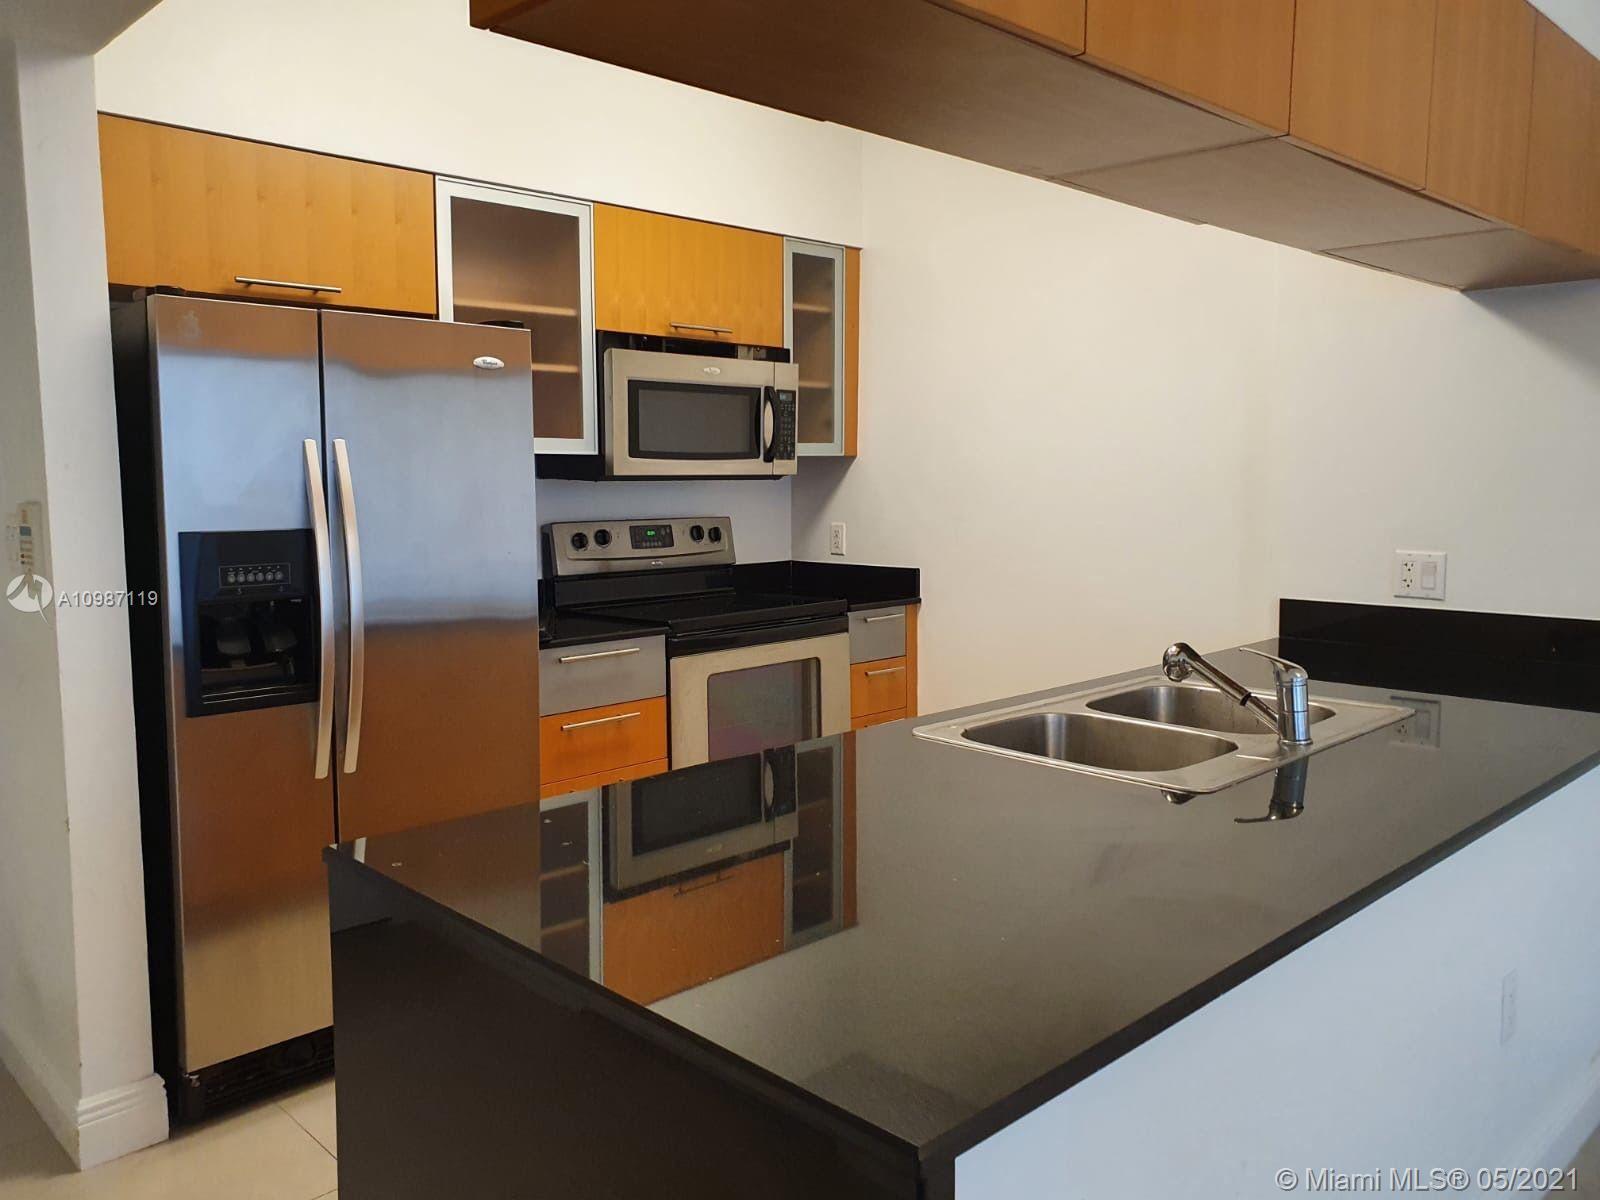 1750 N Bayshore Dr # 3704, Miami, Florida 33132, 1 Bedroom Bedrooms, ,1 BathroomBathrooms,Residential,For Sale,1750 N Bayshore Dr # 3704,A10987119